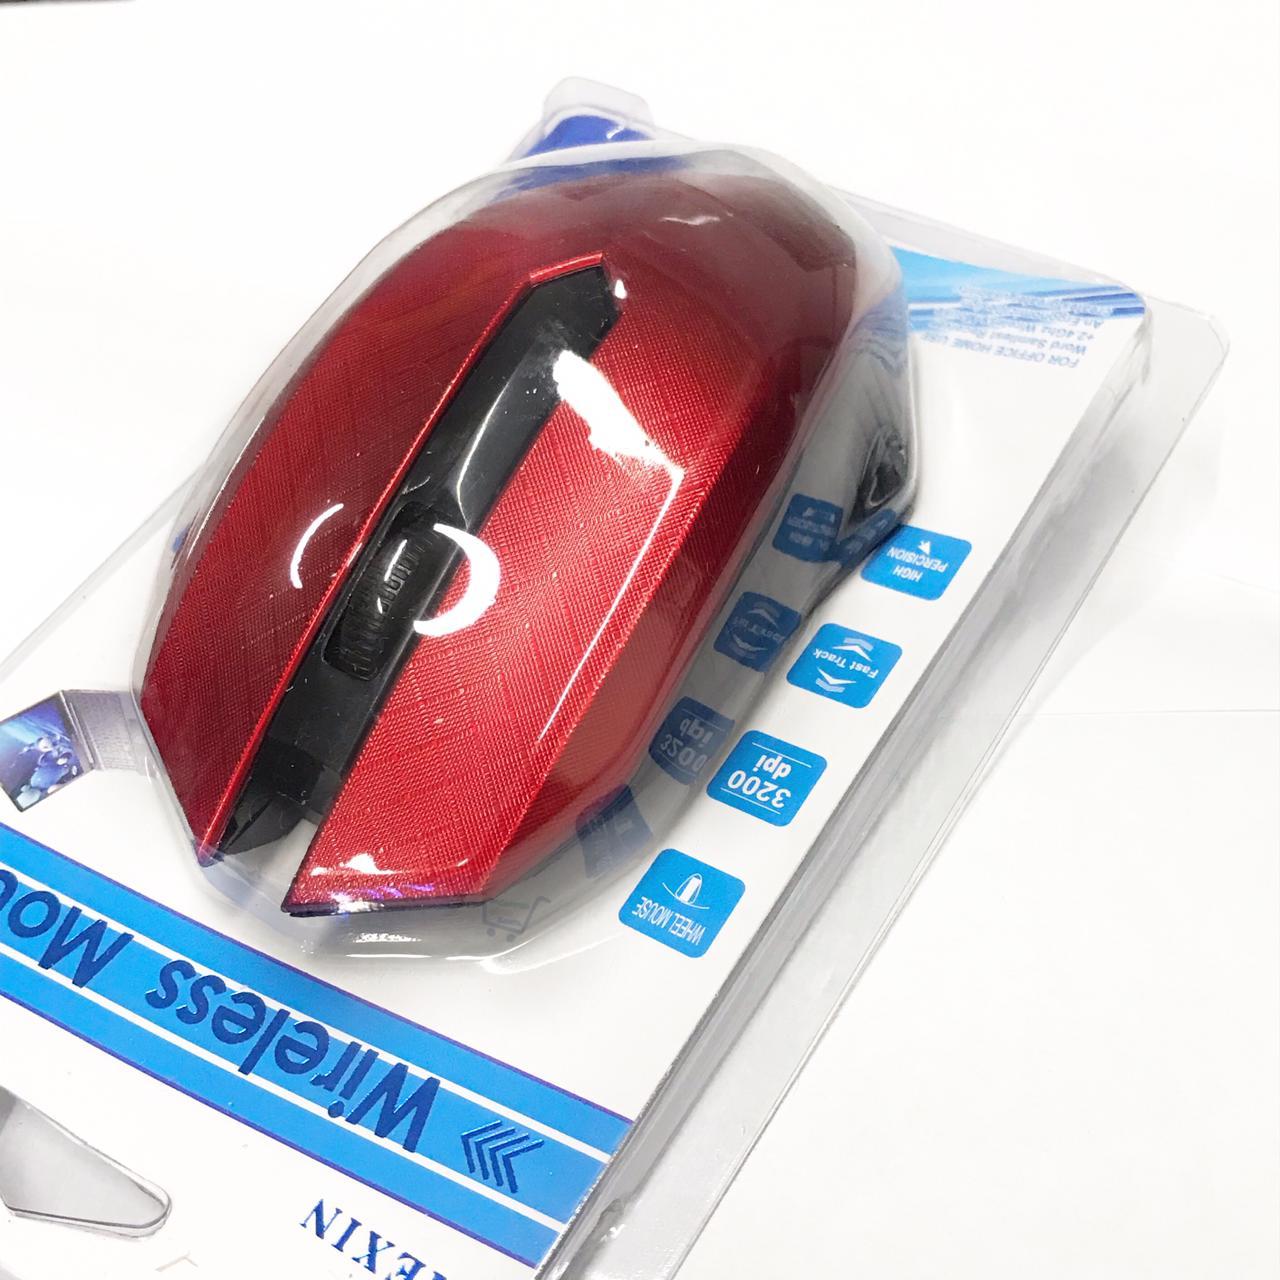 Mouse Wireless Sem Fio Pegada Confortável 2.4ghz Jiexin Alcance 10m